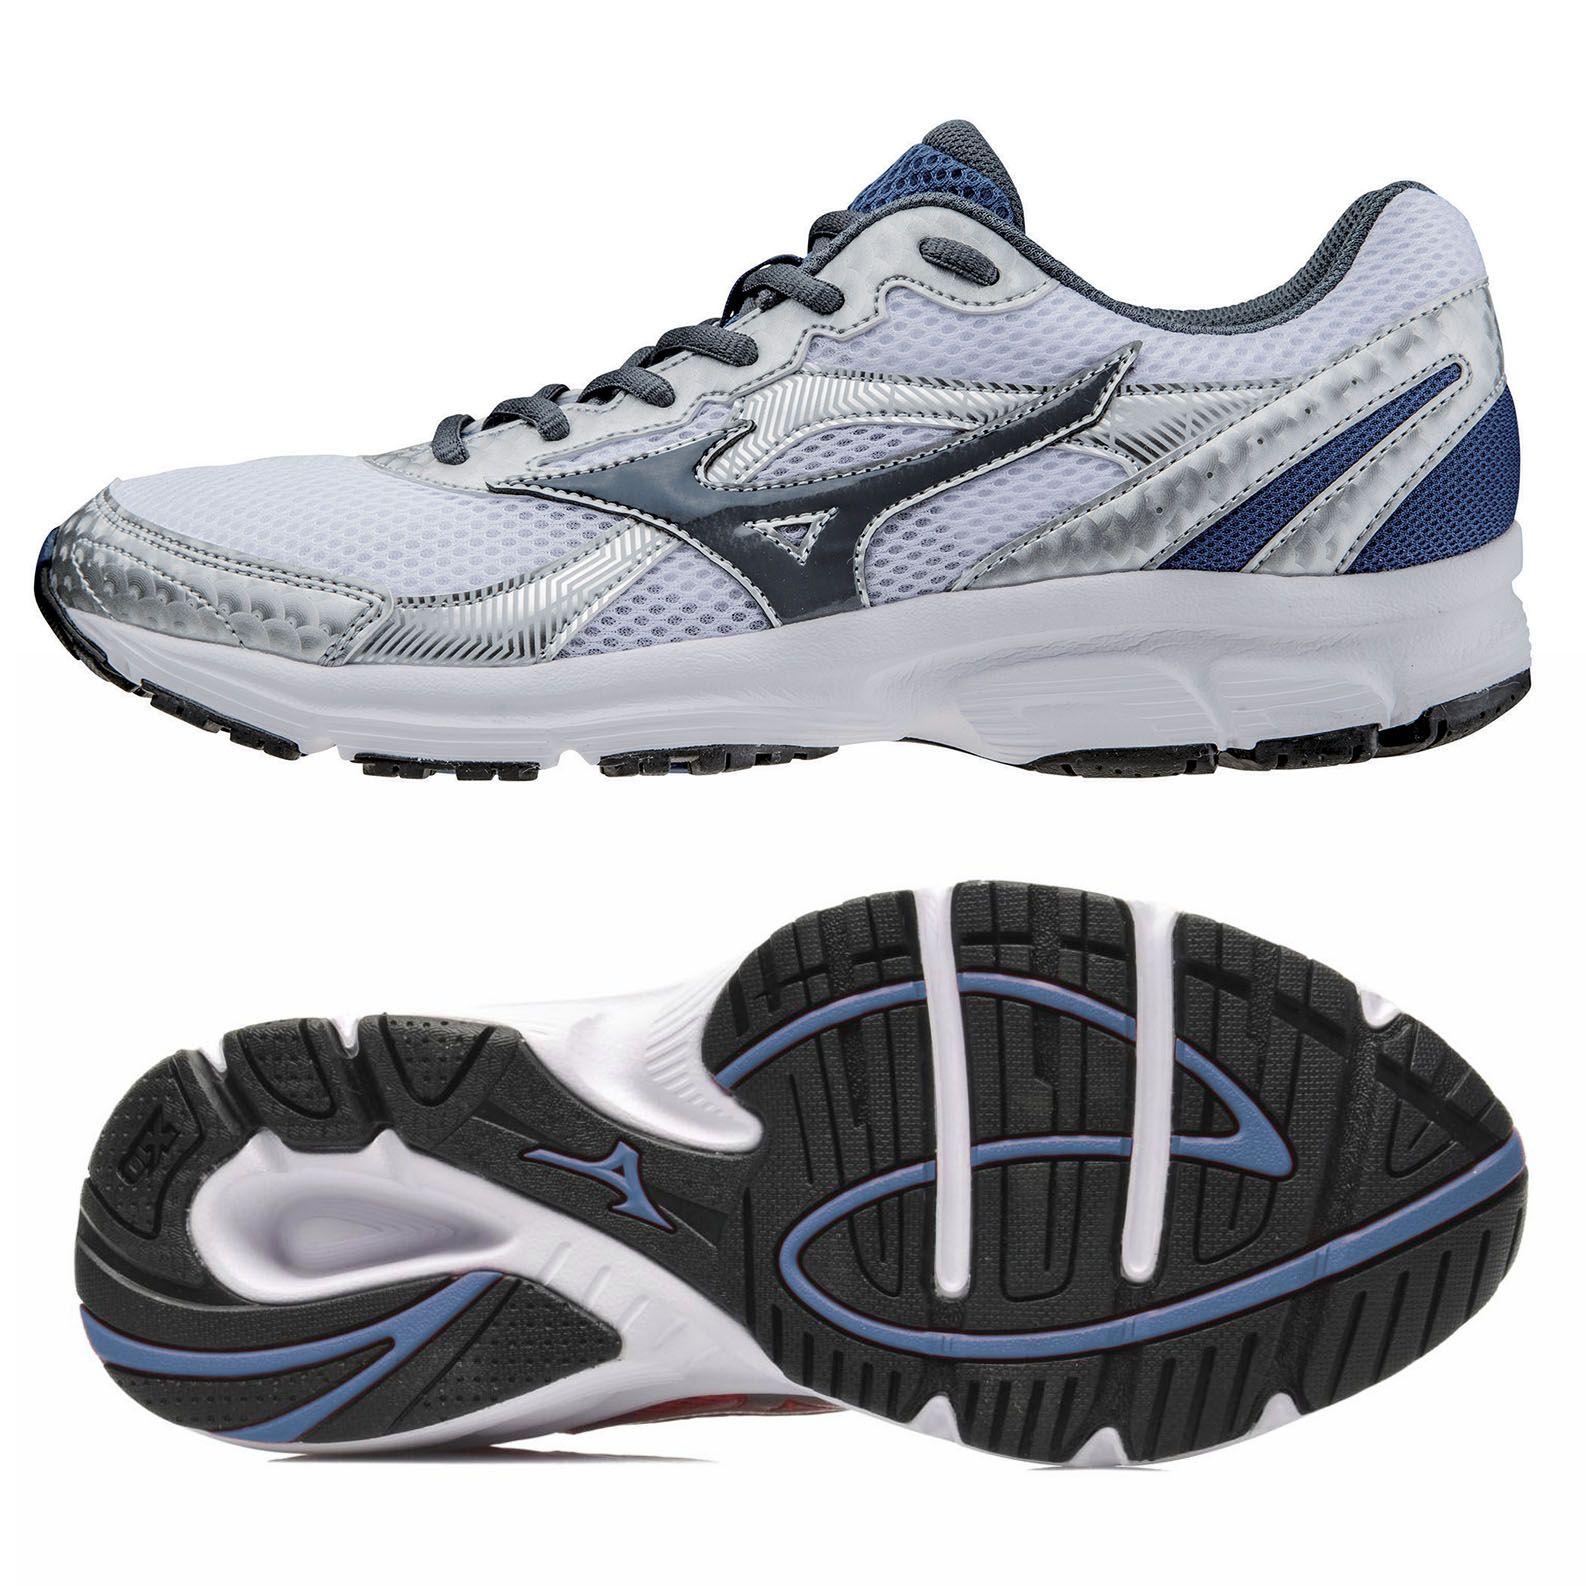 Mizuno Cushioned Running Shoes